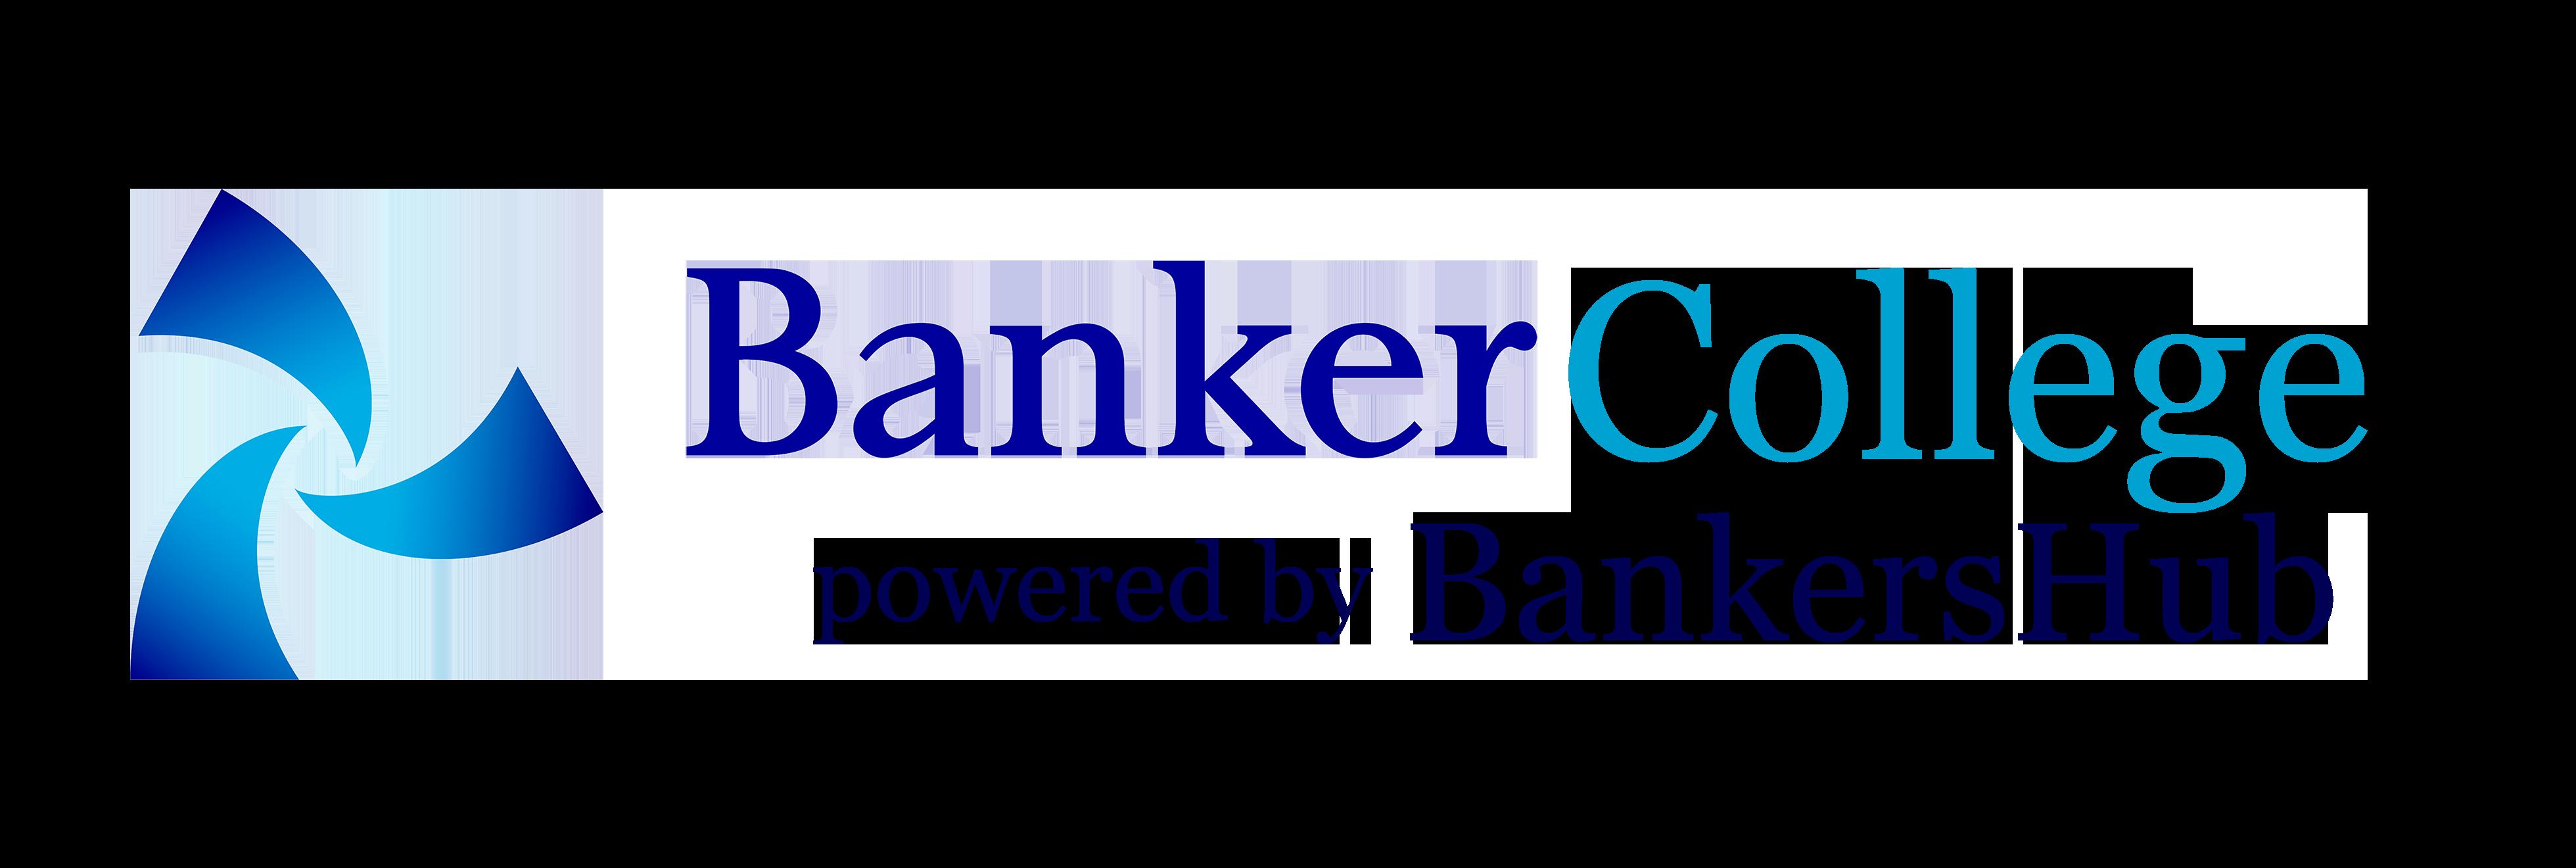 BankerCollege